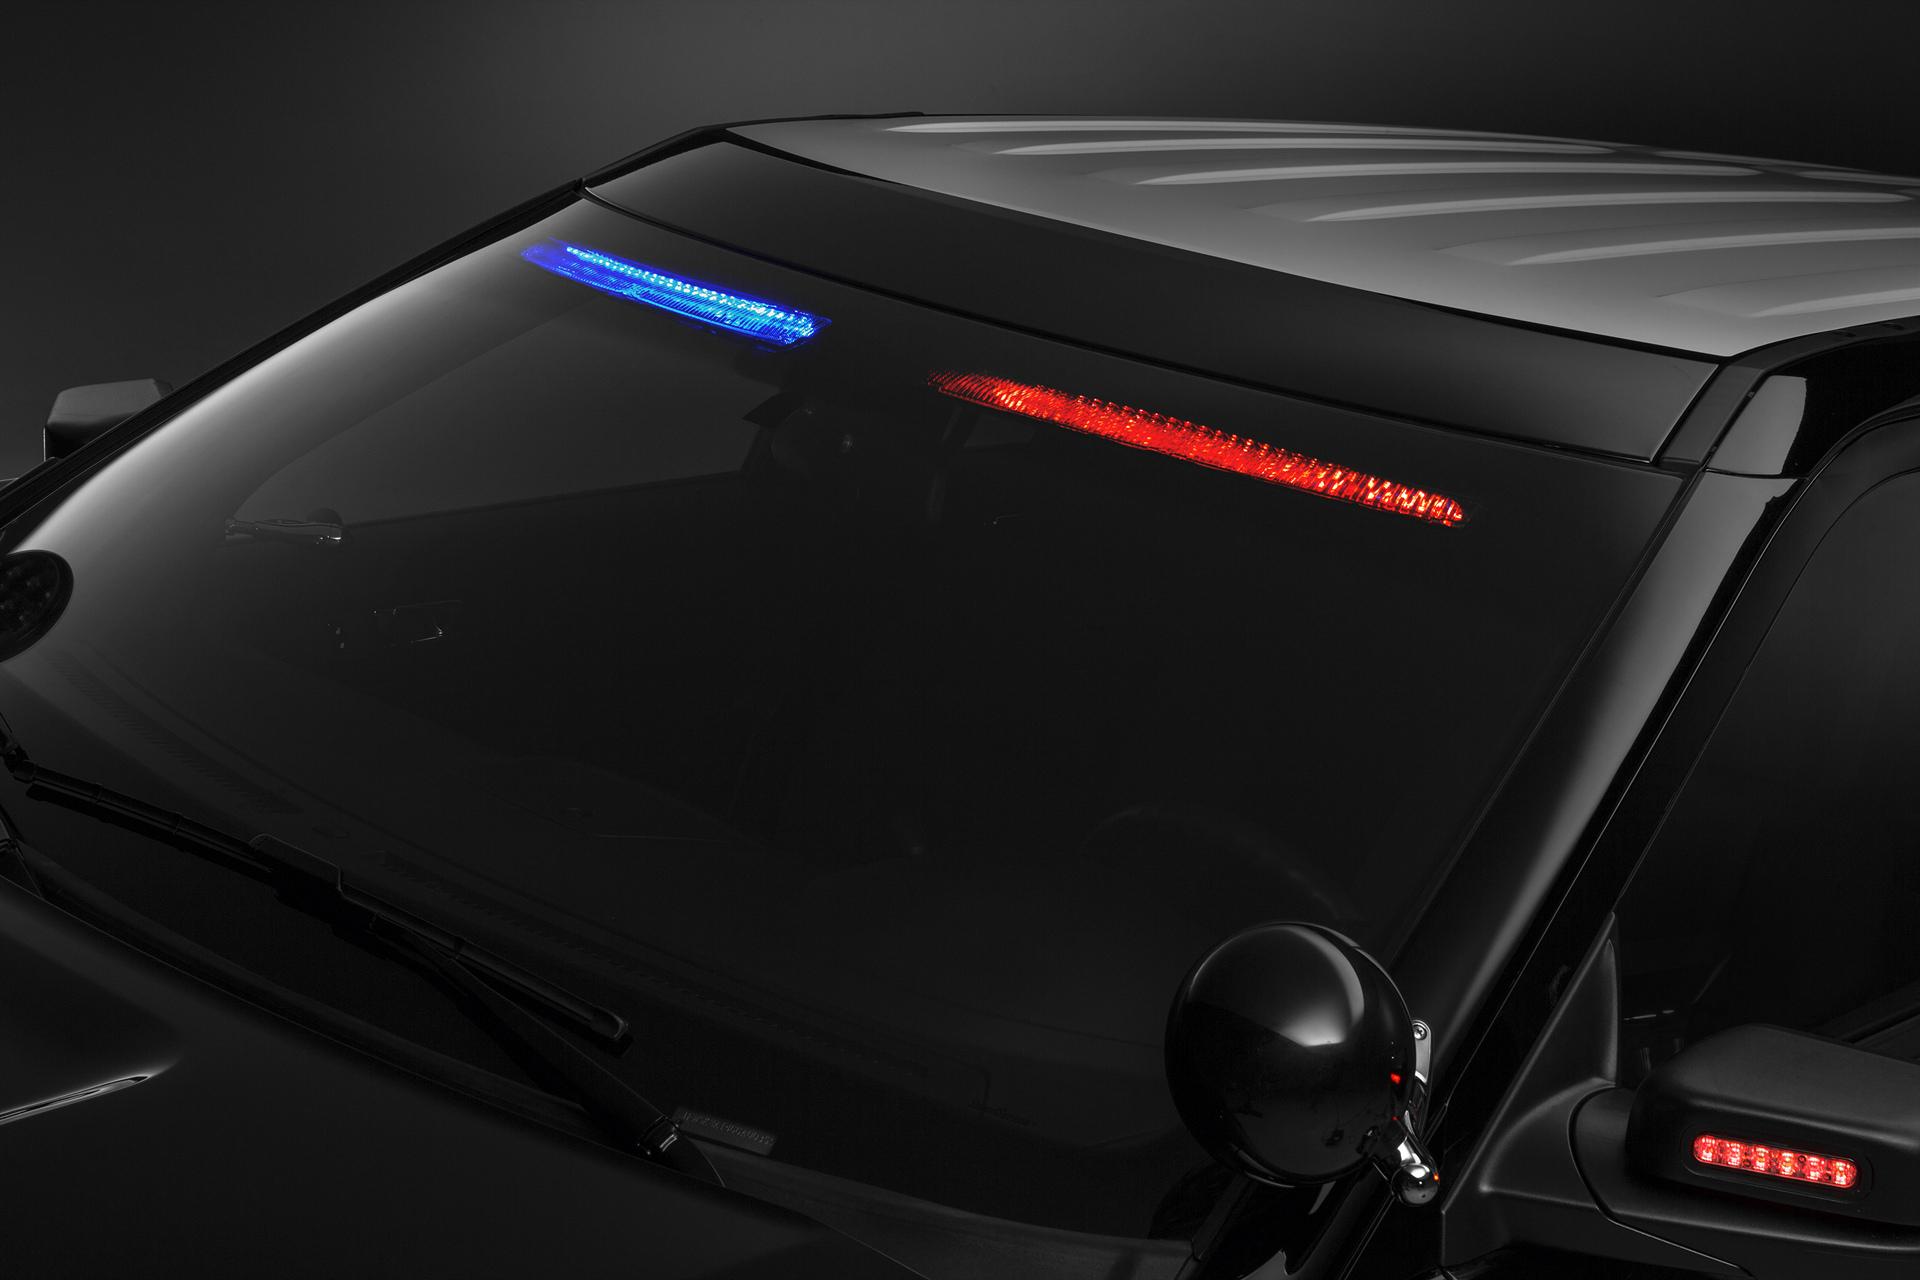 2017 Ford Police Interceptor Utility © Ford Motor Company